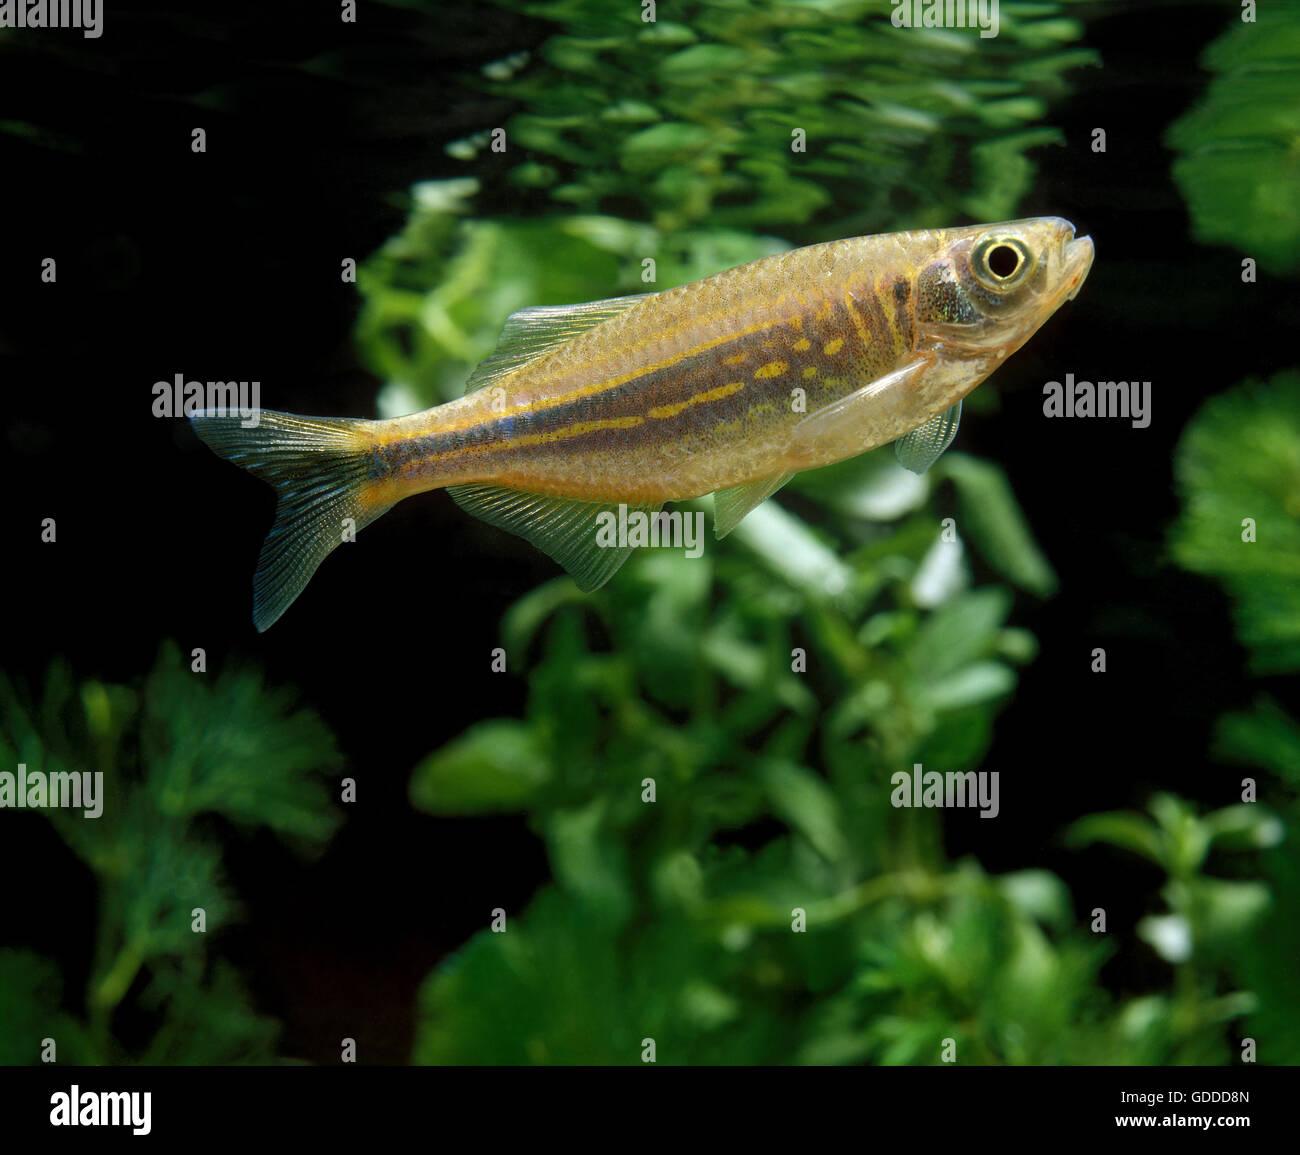 Danios Fish Stock Photos Danios Fish Stock Images Alamy